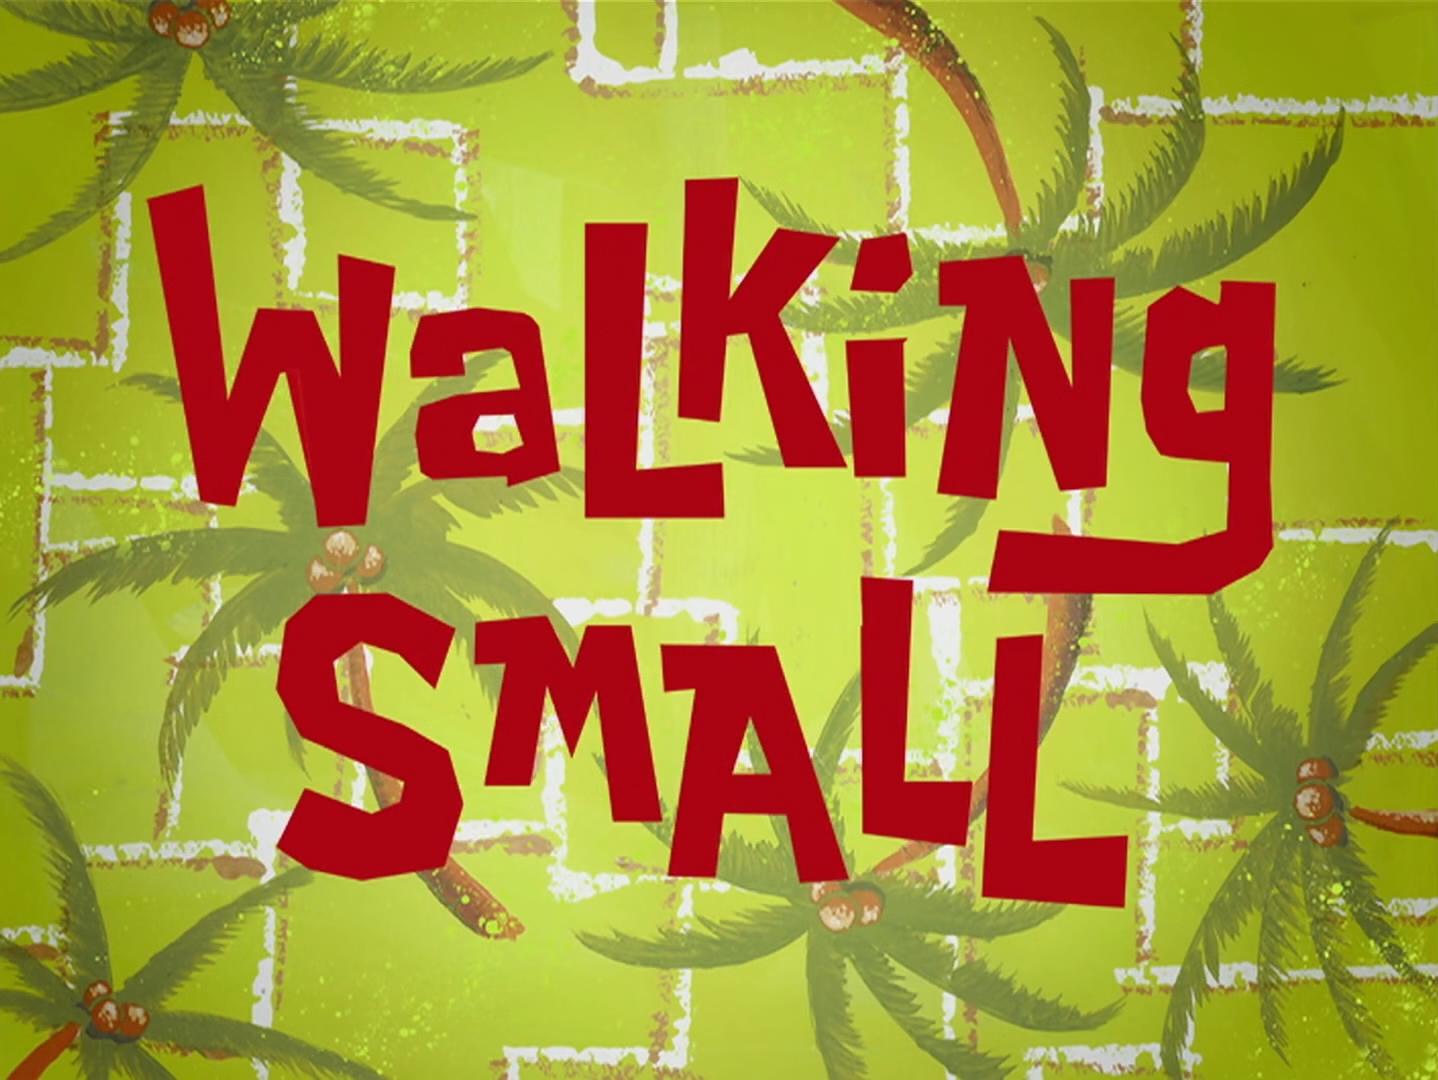 Walking Small